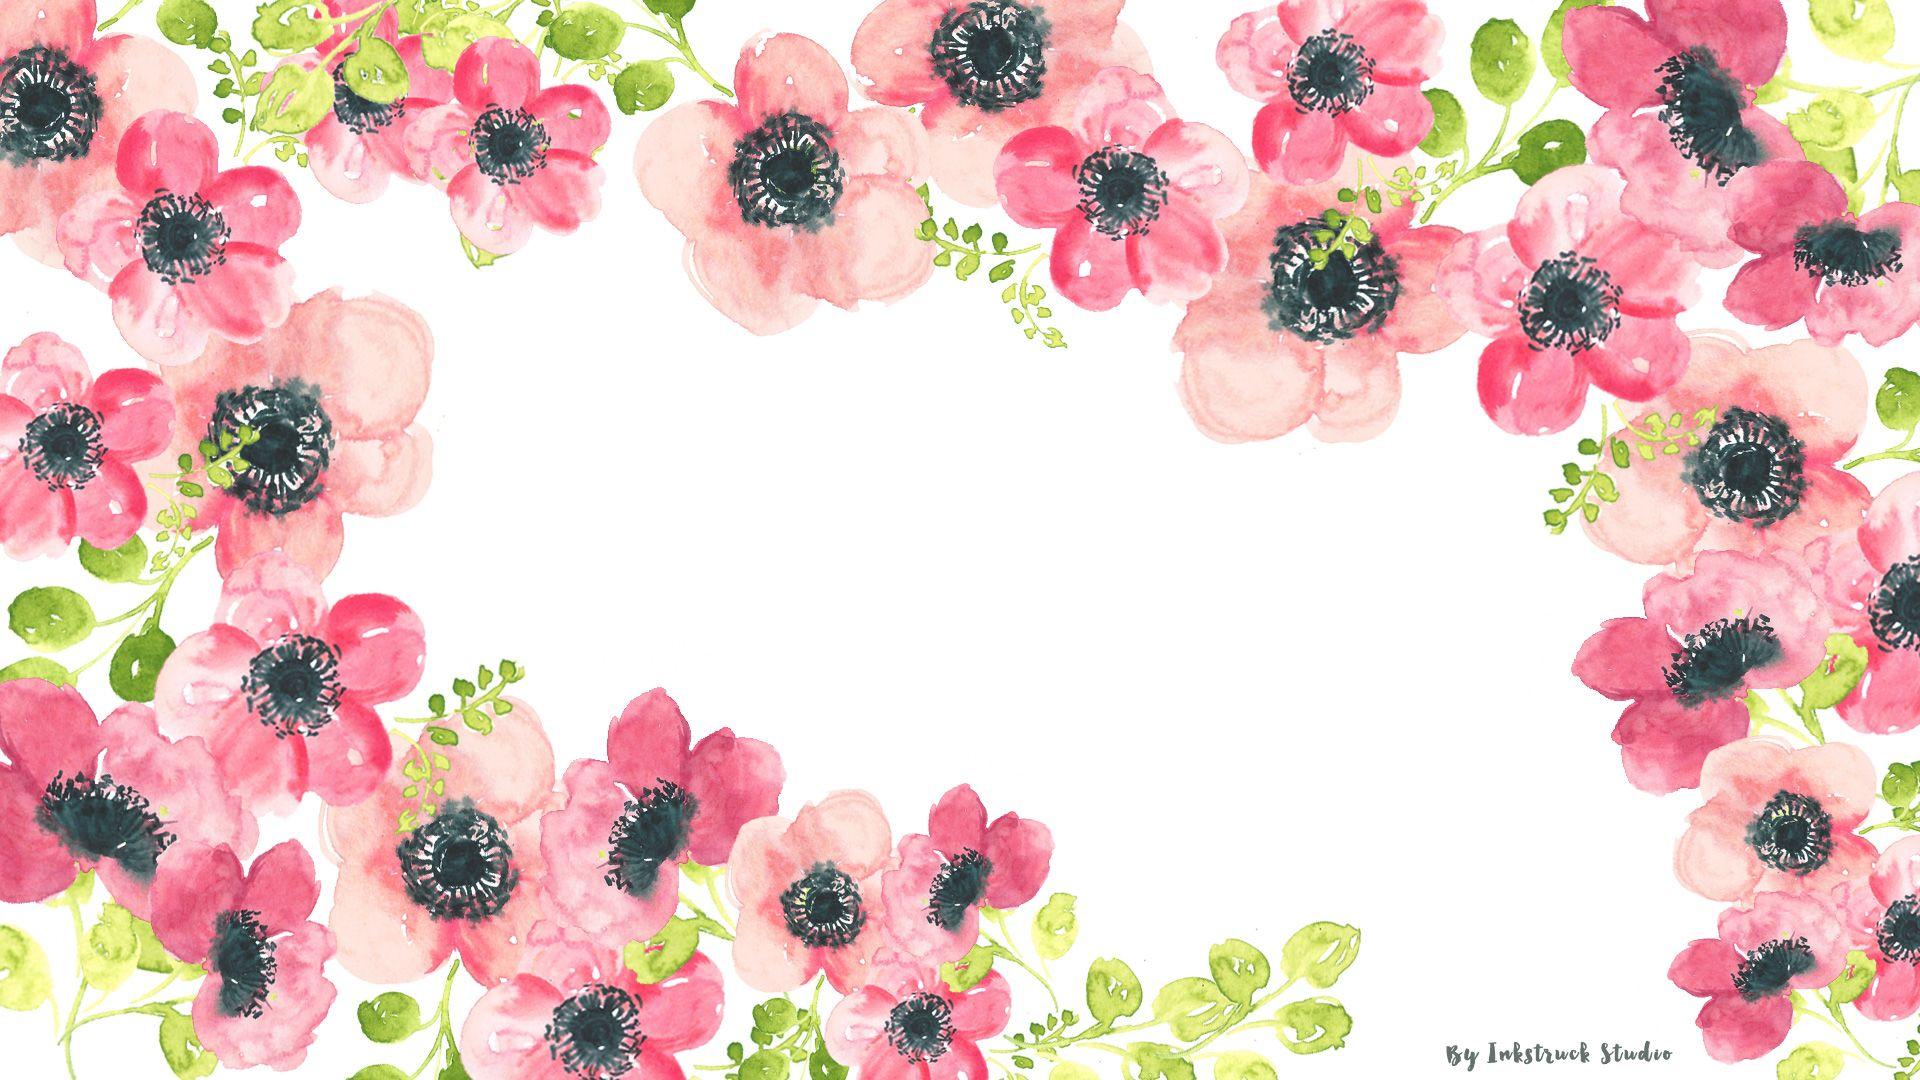 watercolorfloraldesktopwallpaper.jpg 1,920×1,080 pixels